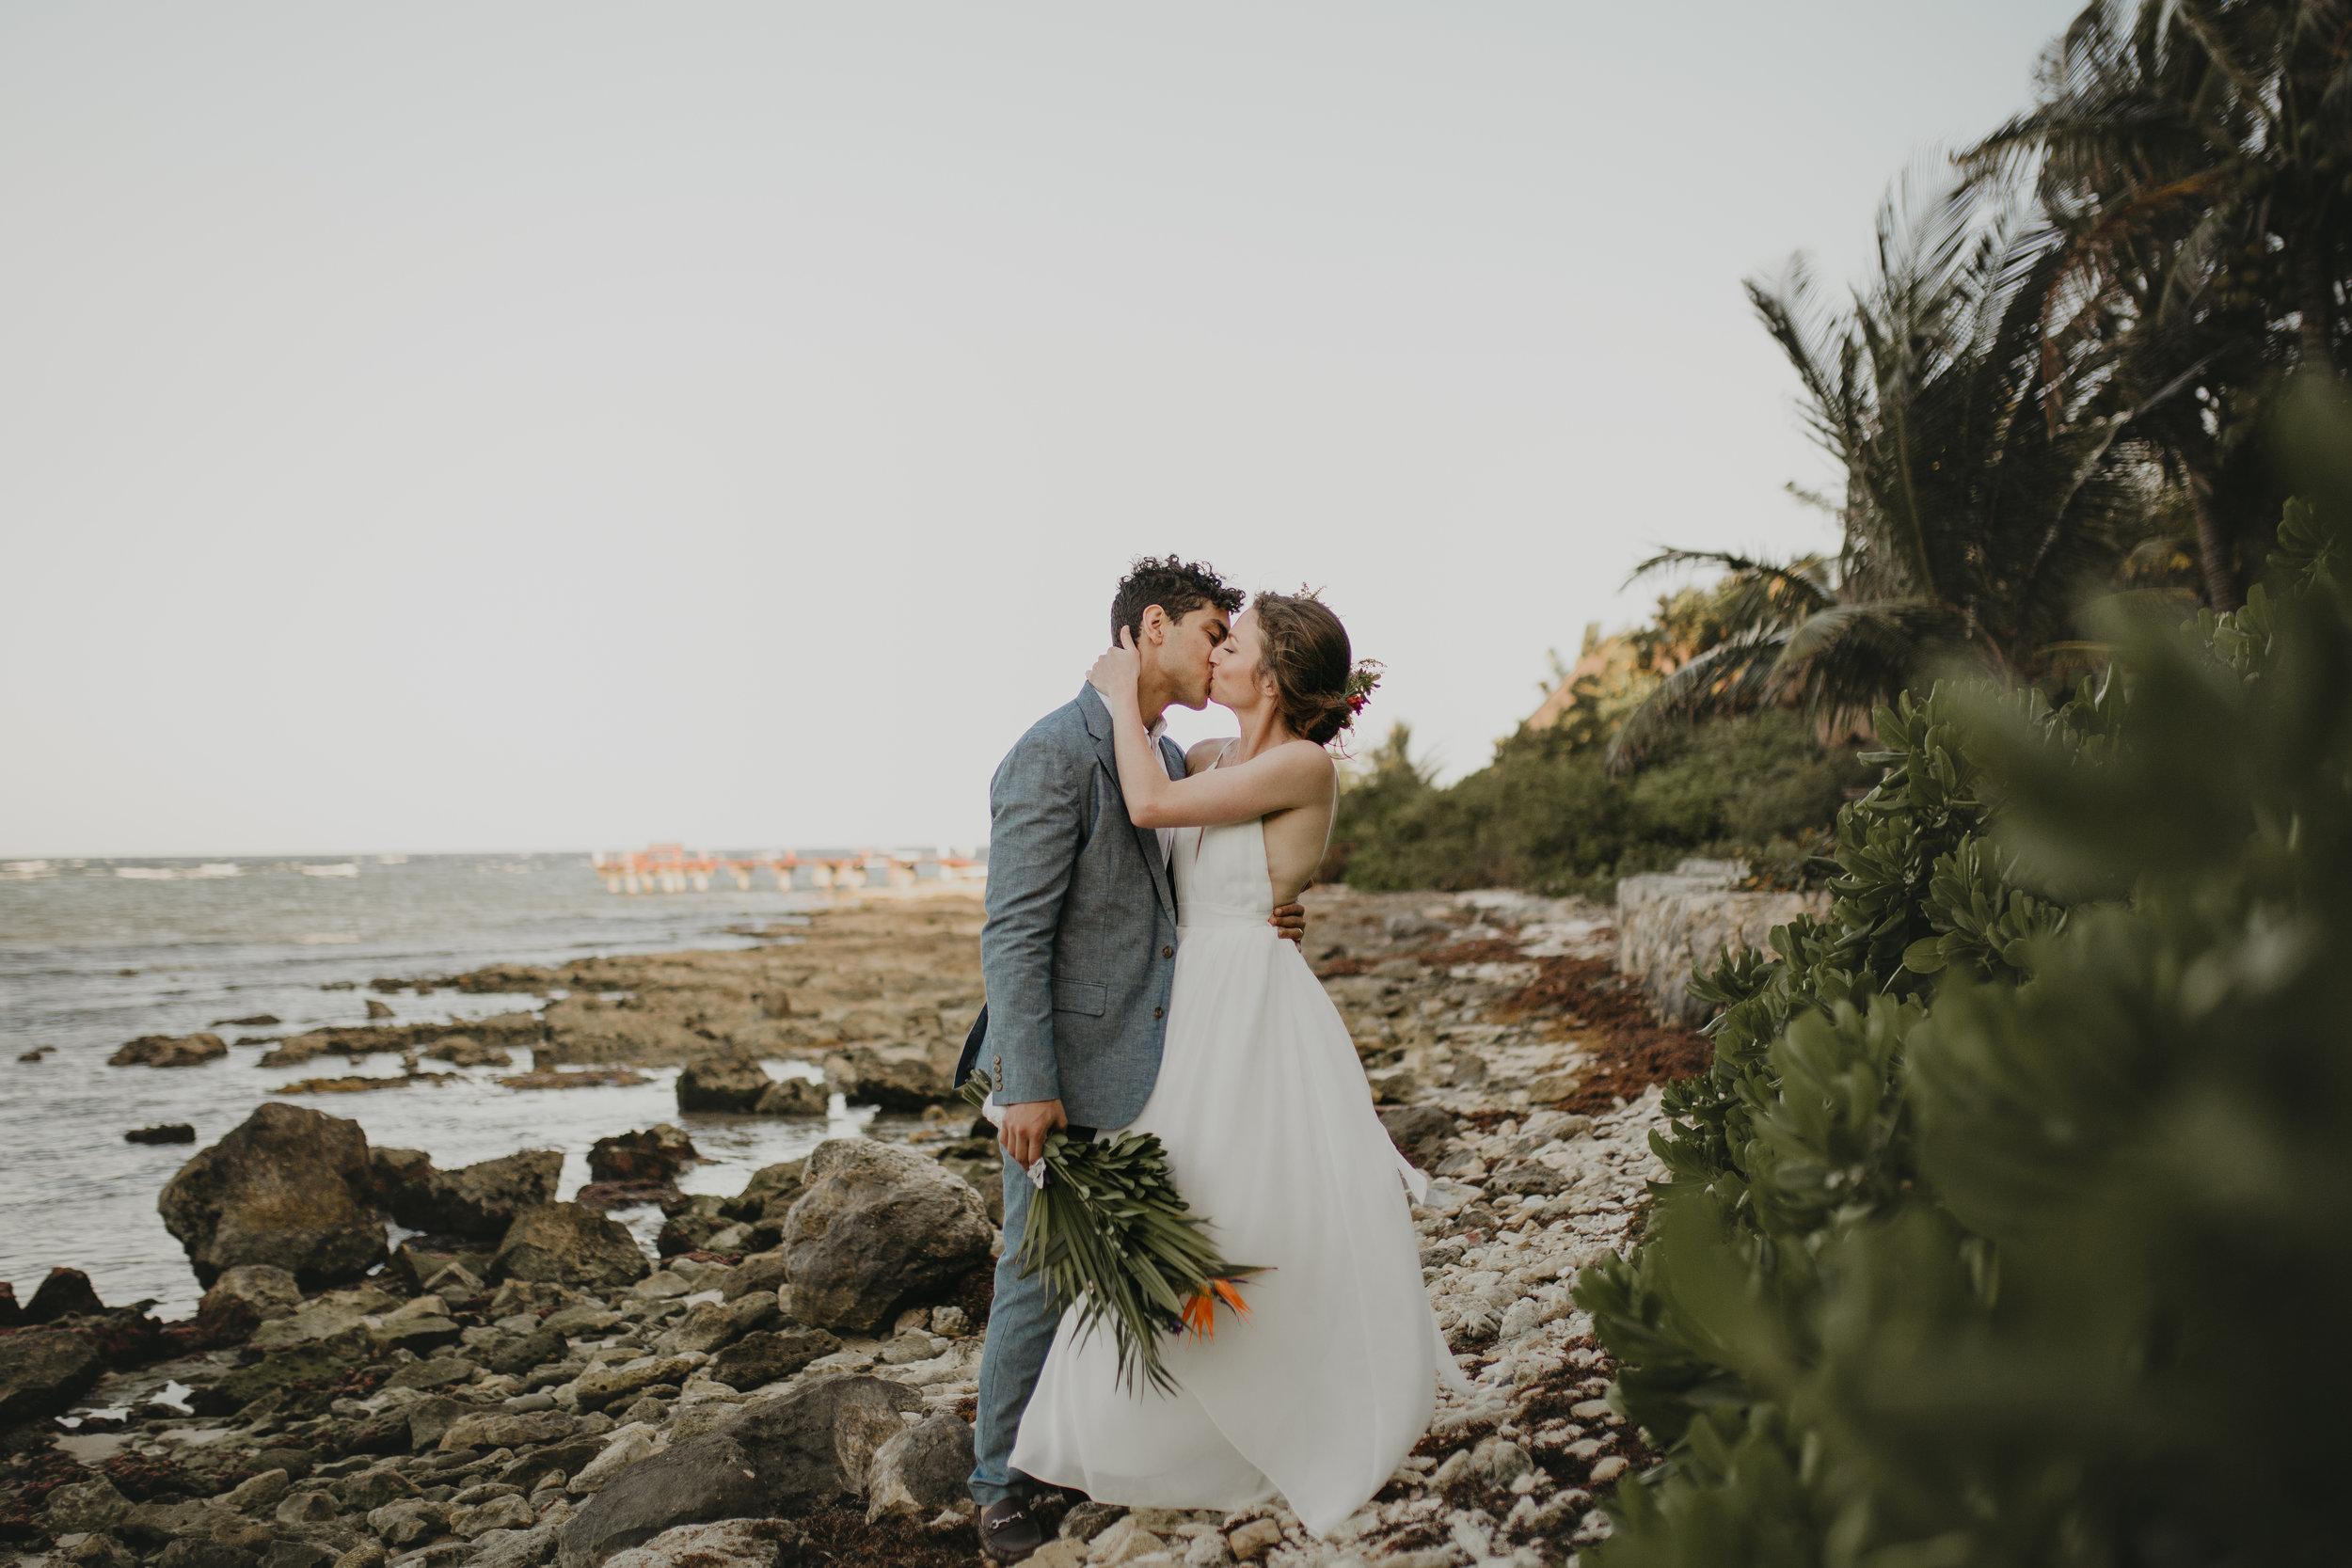 Nicole-Daacke-Photography-beachfront-akumal-destionation-wedding-tulum-mexico-elopement-photographer-destination-wedding-inspiration-sunset-champagne-pop-boho-bride-ocean-tropical-bohemian-tulum-wedding-photos-178.jpg